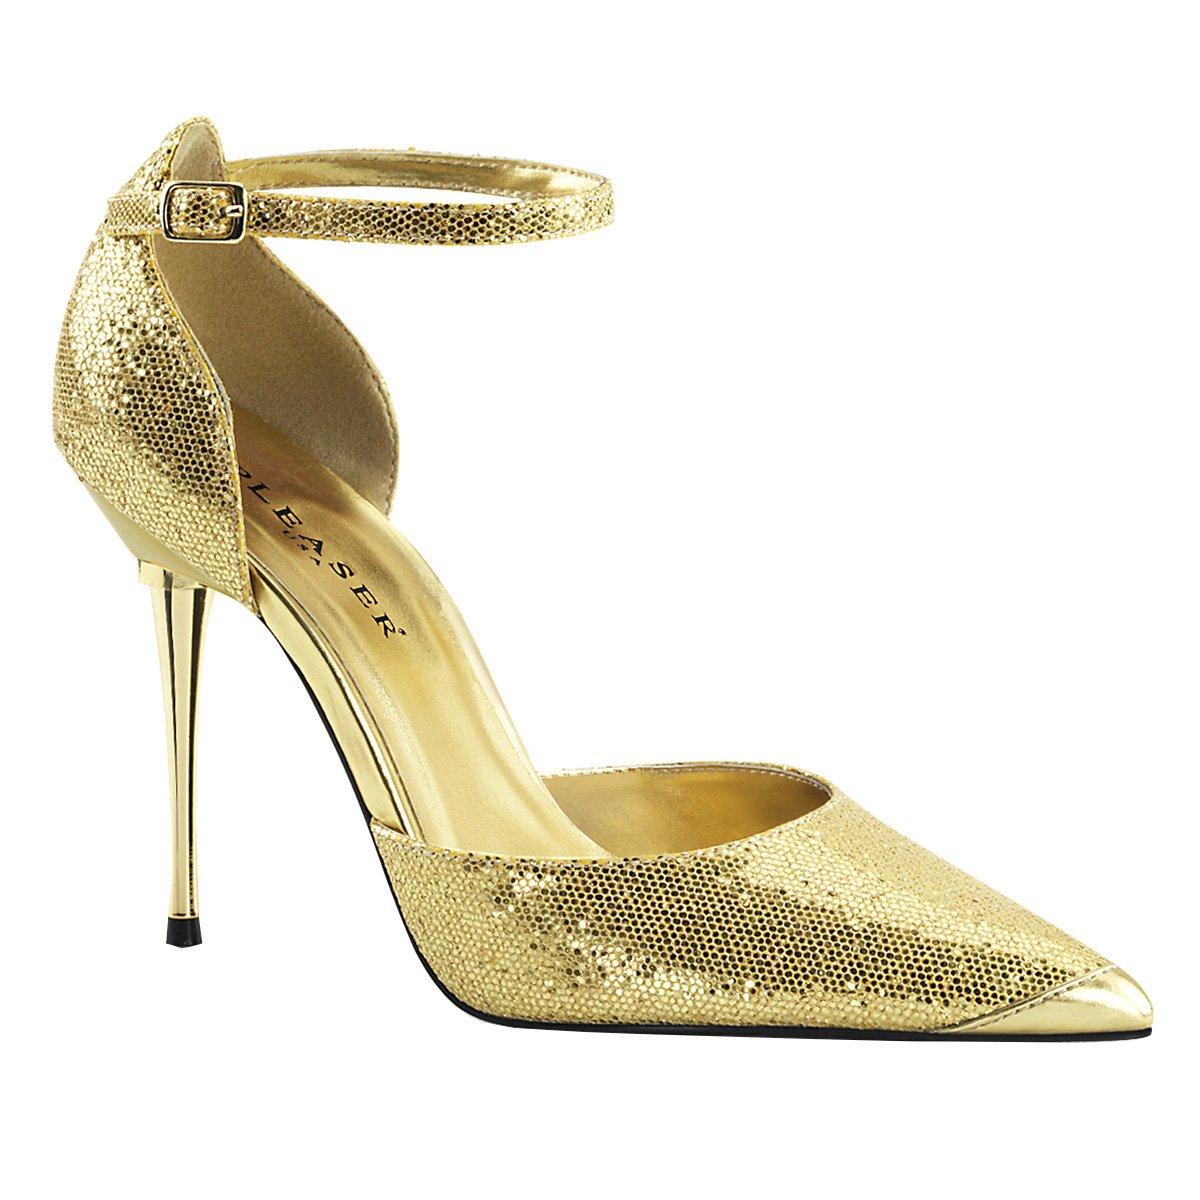 PleaserUSA Spitze Damen Stiletto Pumps mit Fesselriemchen Appeal-21 Gold Woven